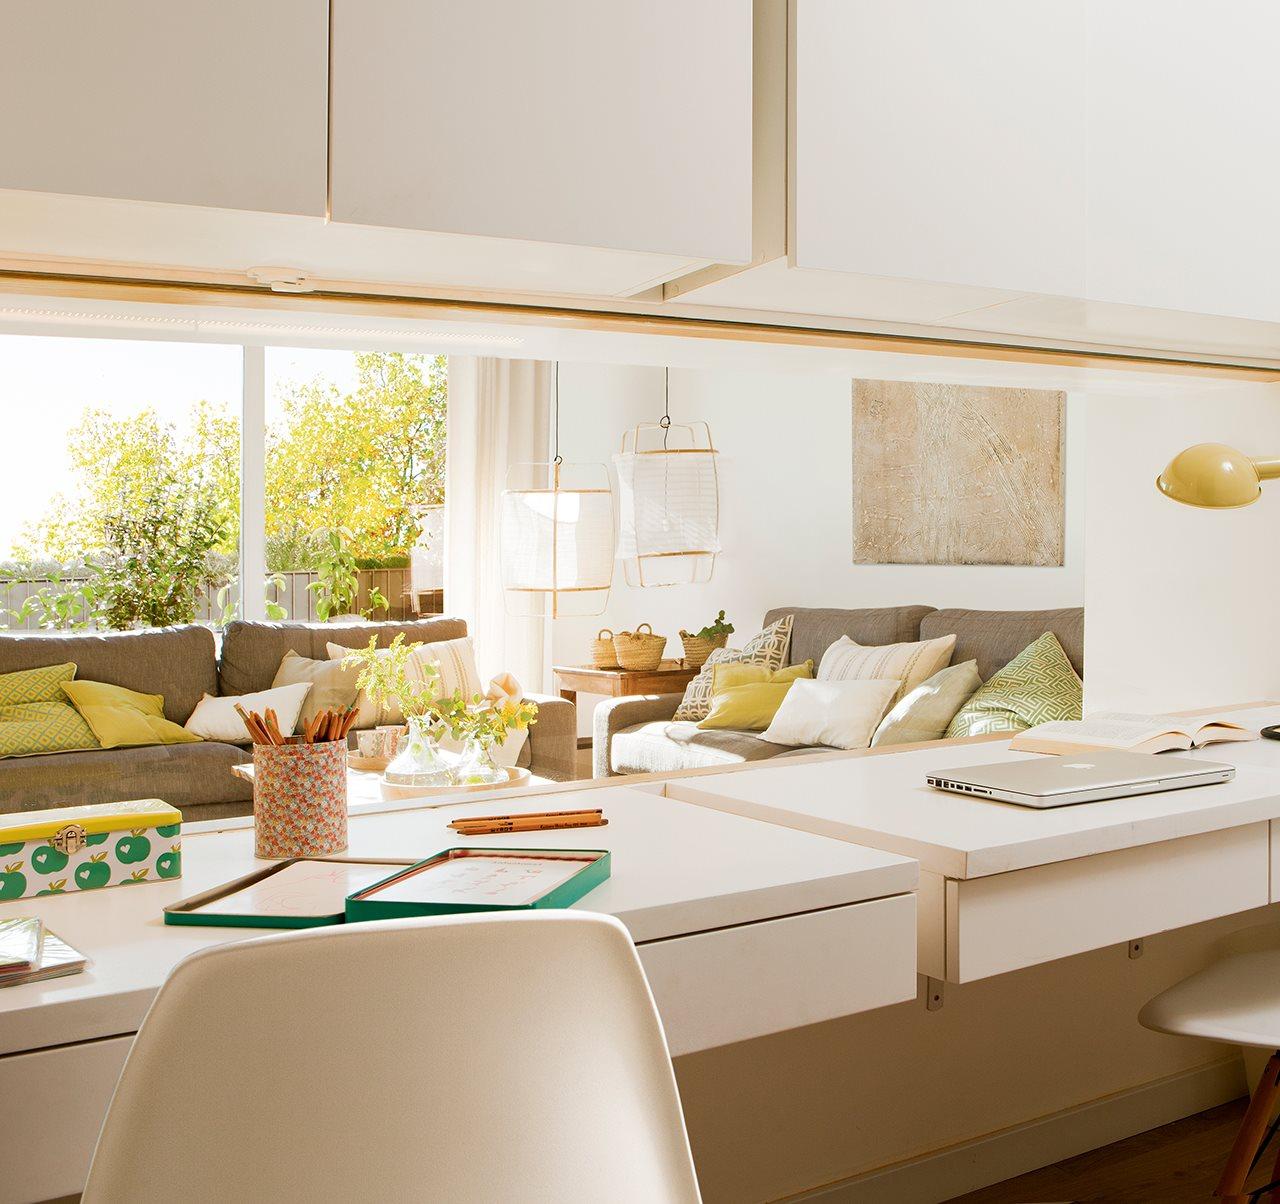 дизайн интерьера малогабаритных квартир эконом класса 13